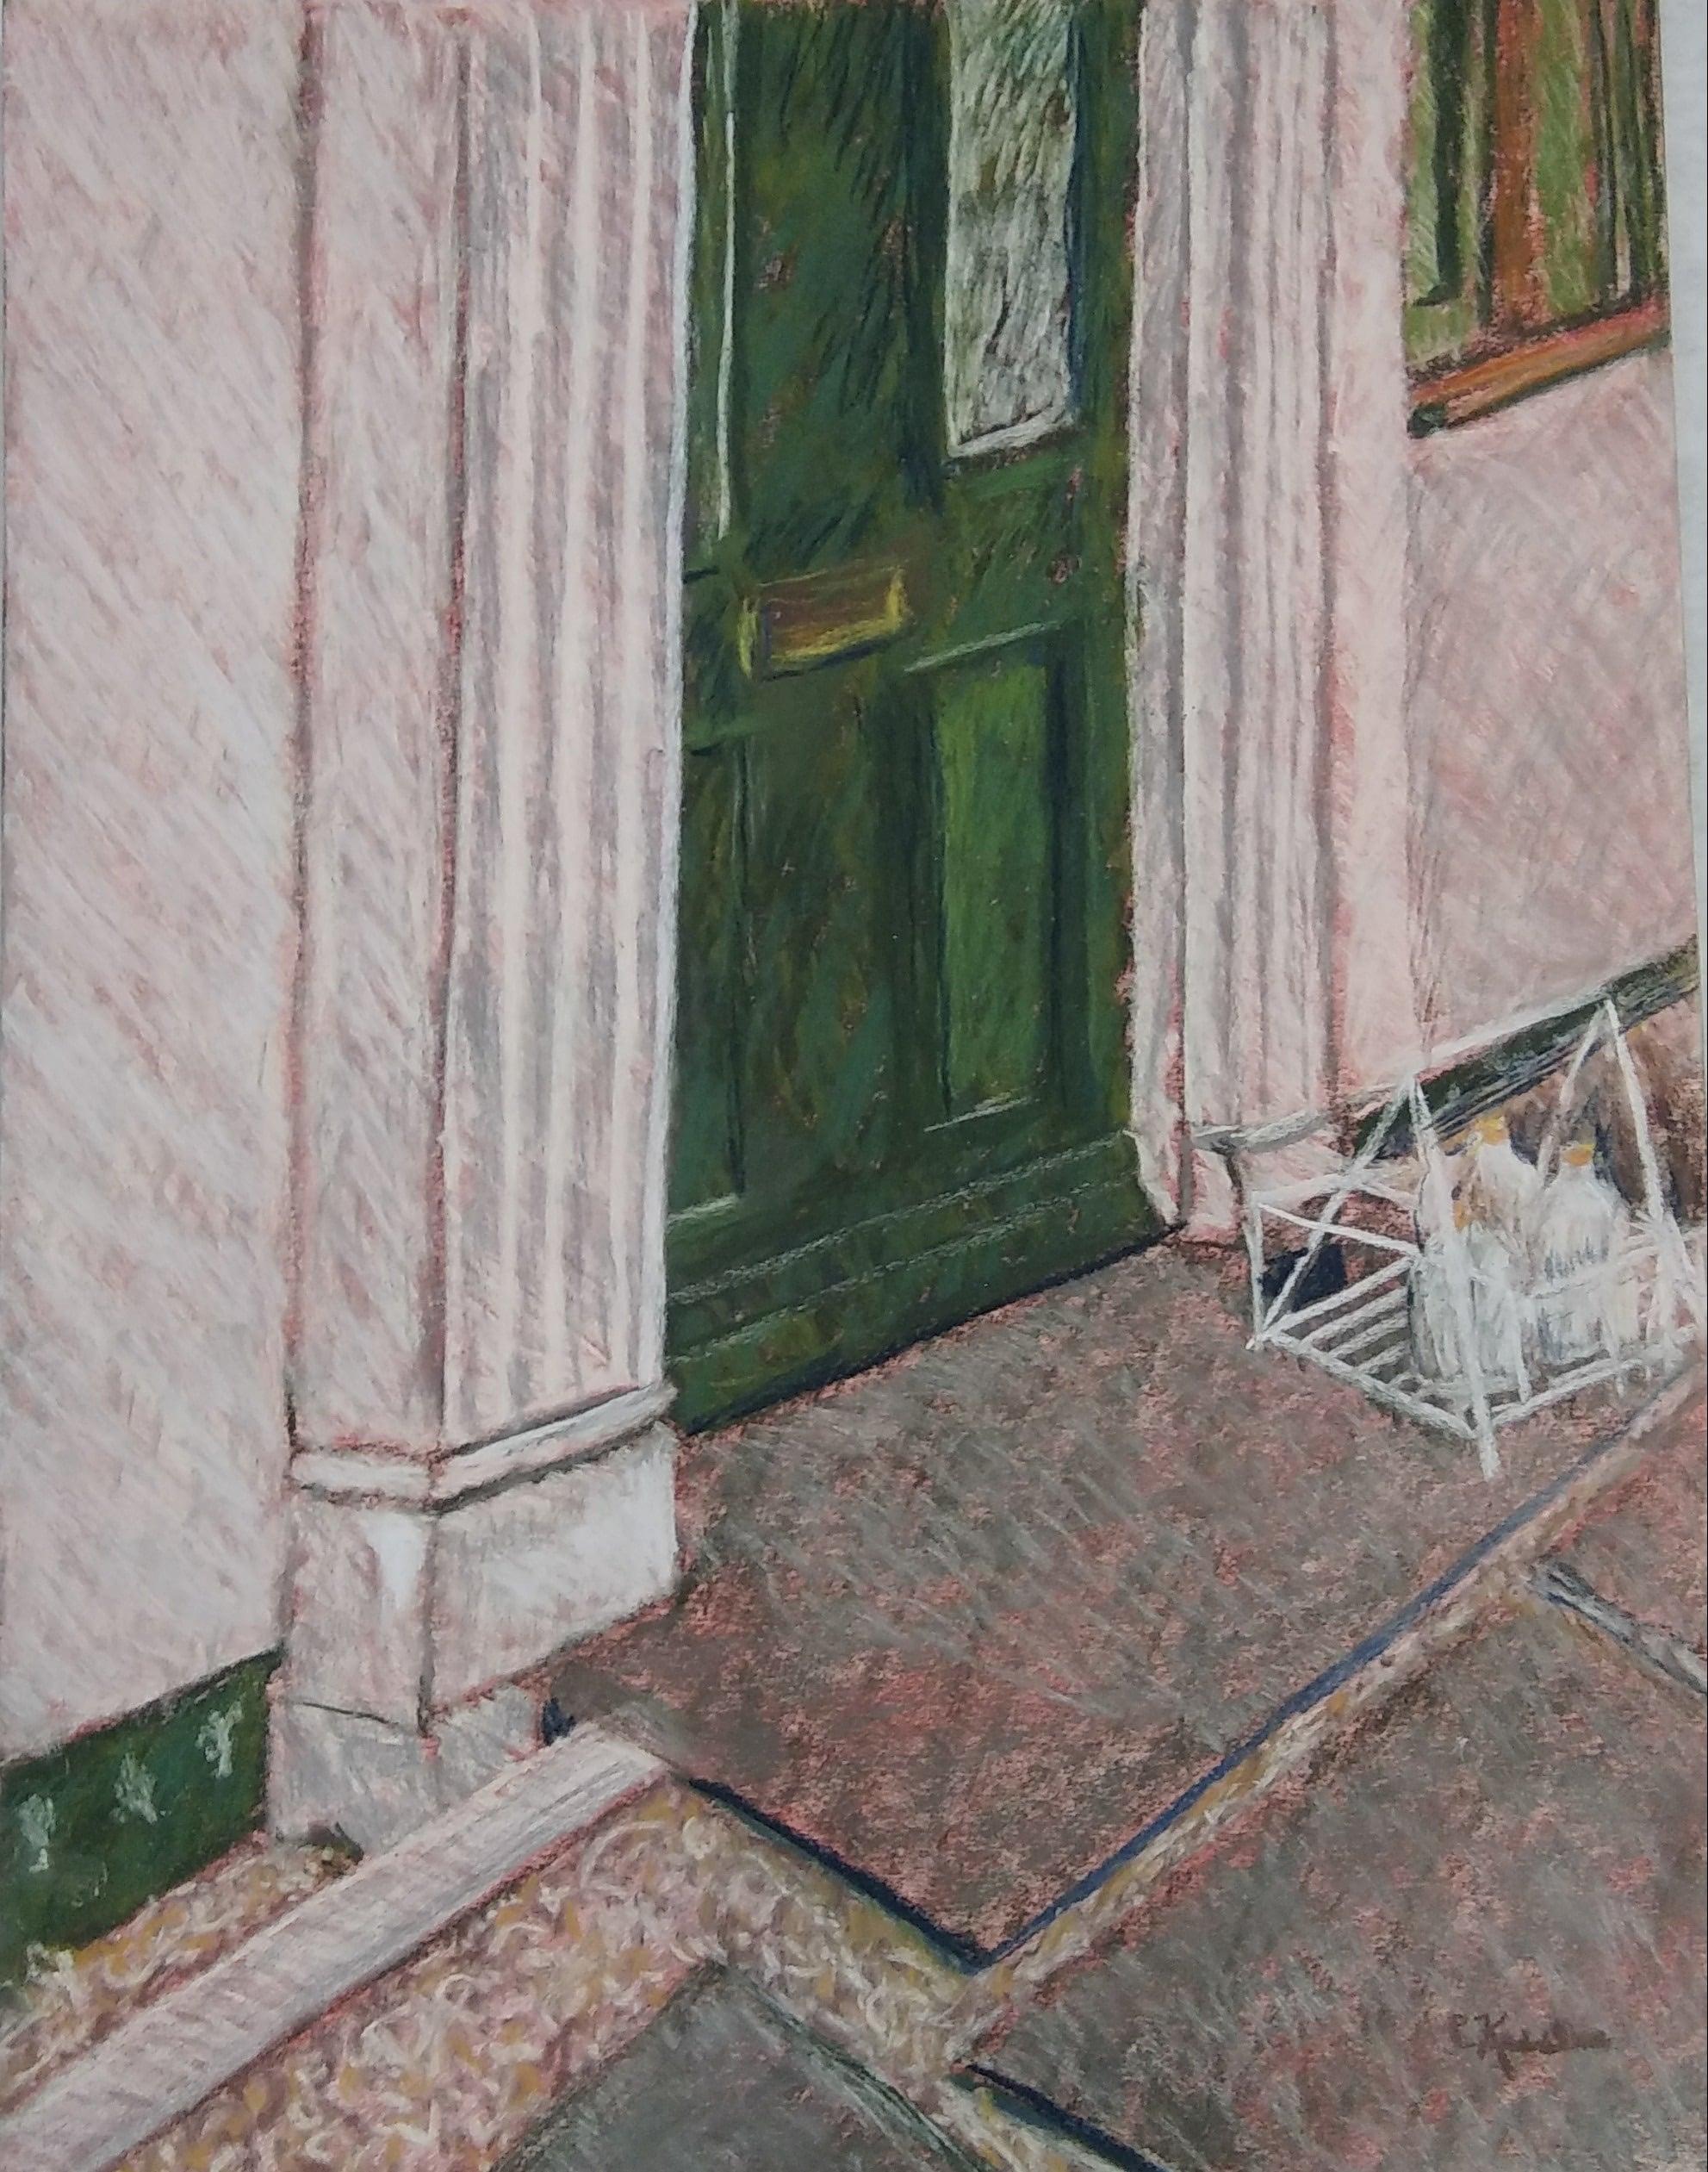 Pitlochery Morning by Carol Kessler